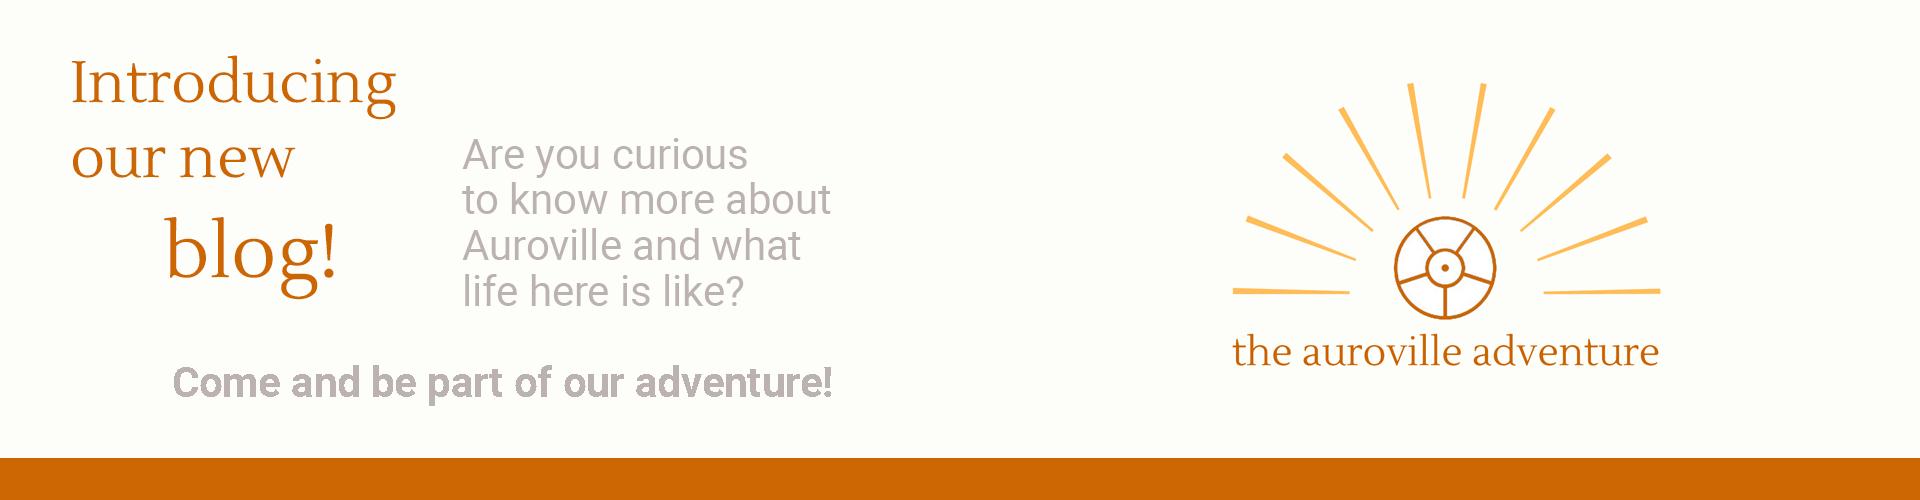 the blog adventure